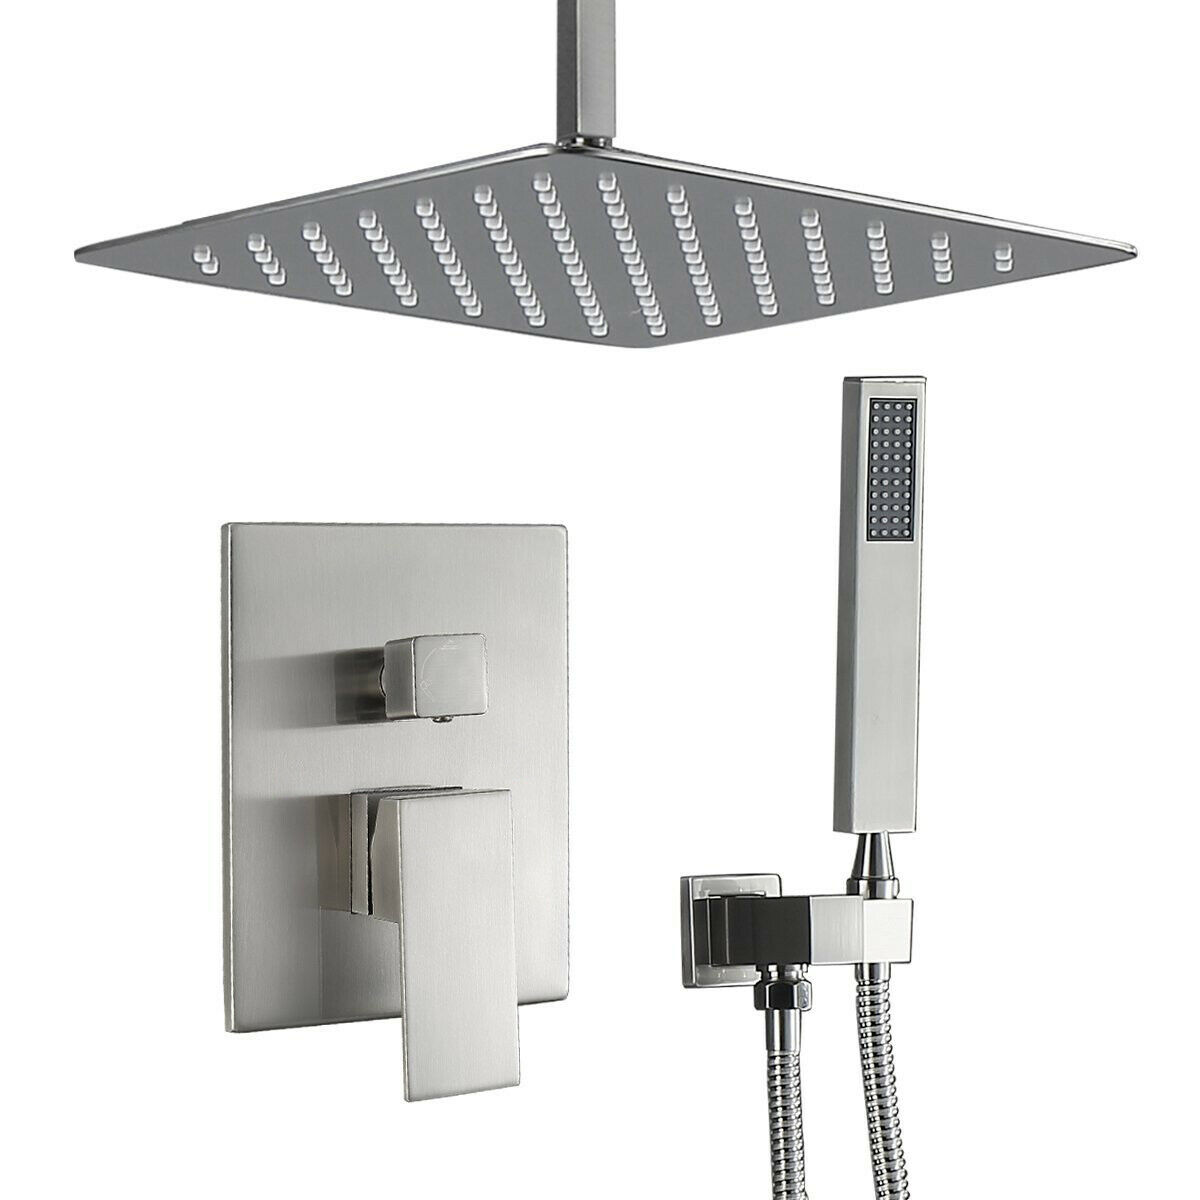 Brushed Nickel Shower Faucet Set Rain Shower Head System Wall Mounted Bathroom For Sale Online Ebay